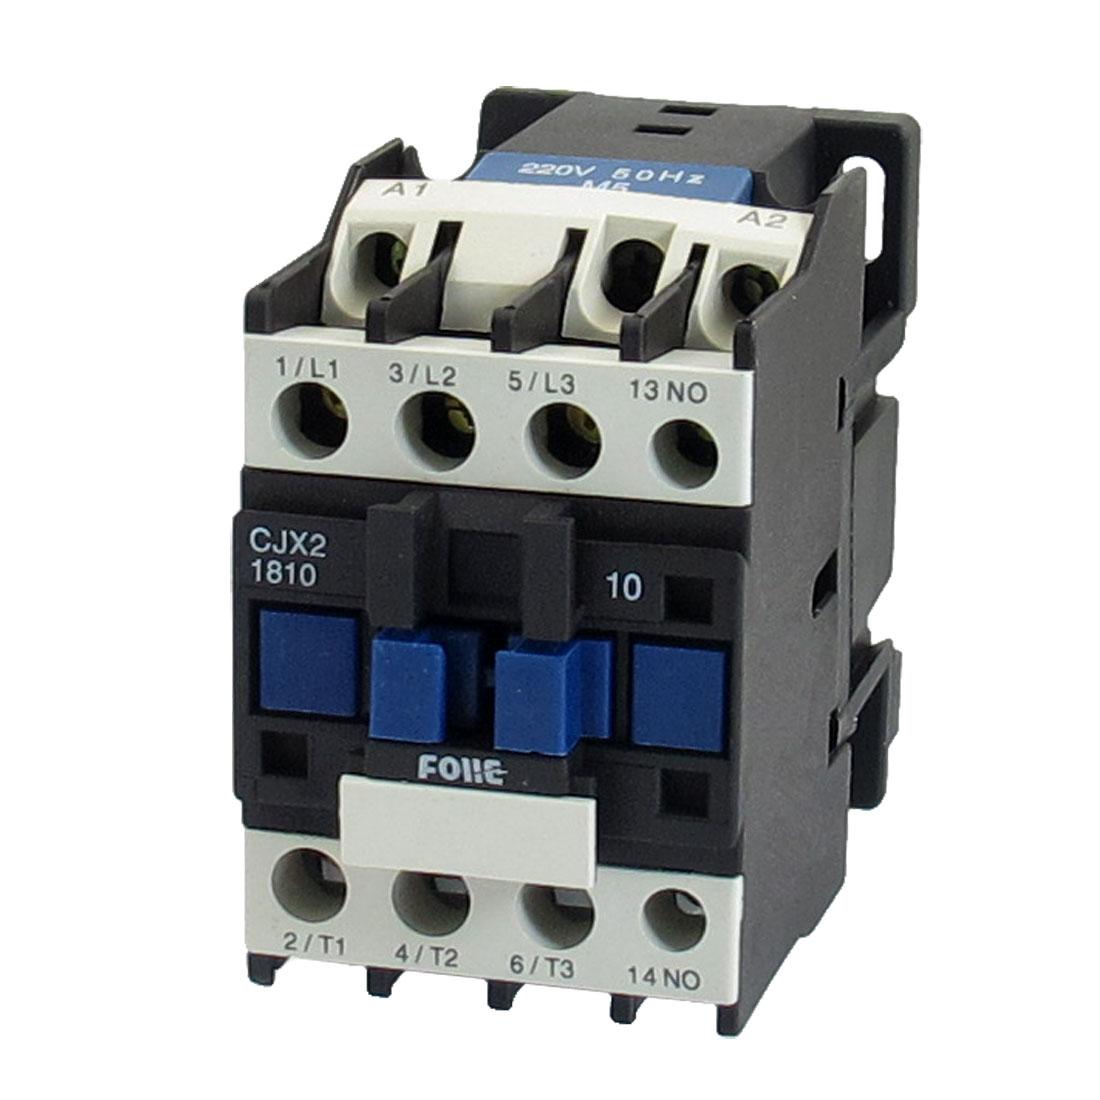 380V 7.5KW 3 Phase 3P N/O AC Contactor DIN Rail Mount 220V Coil CJX2-1810